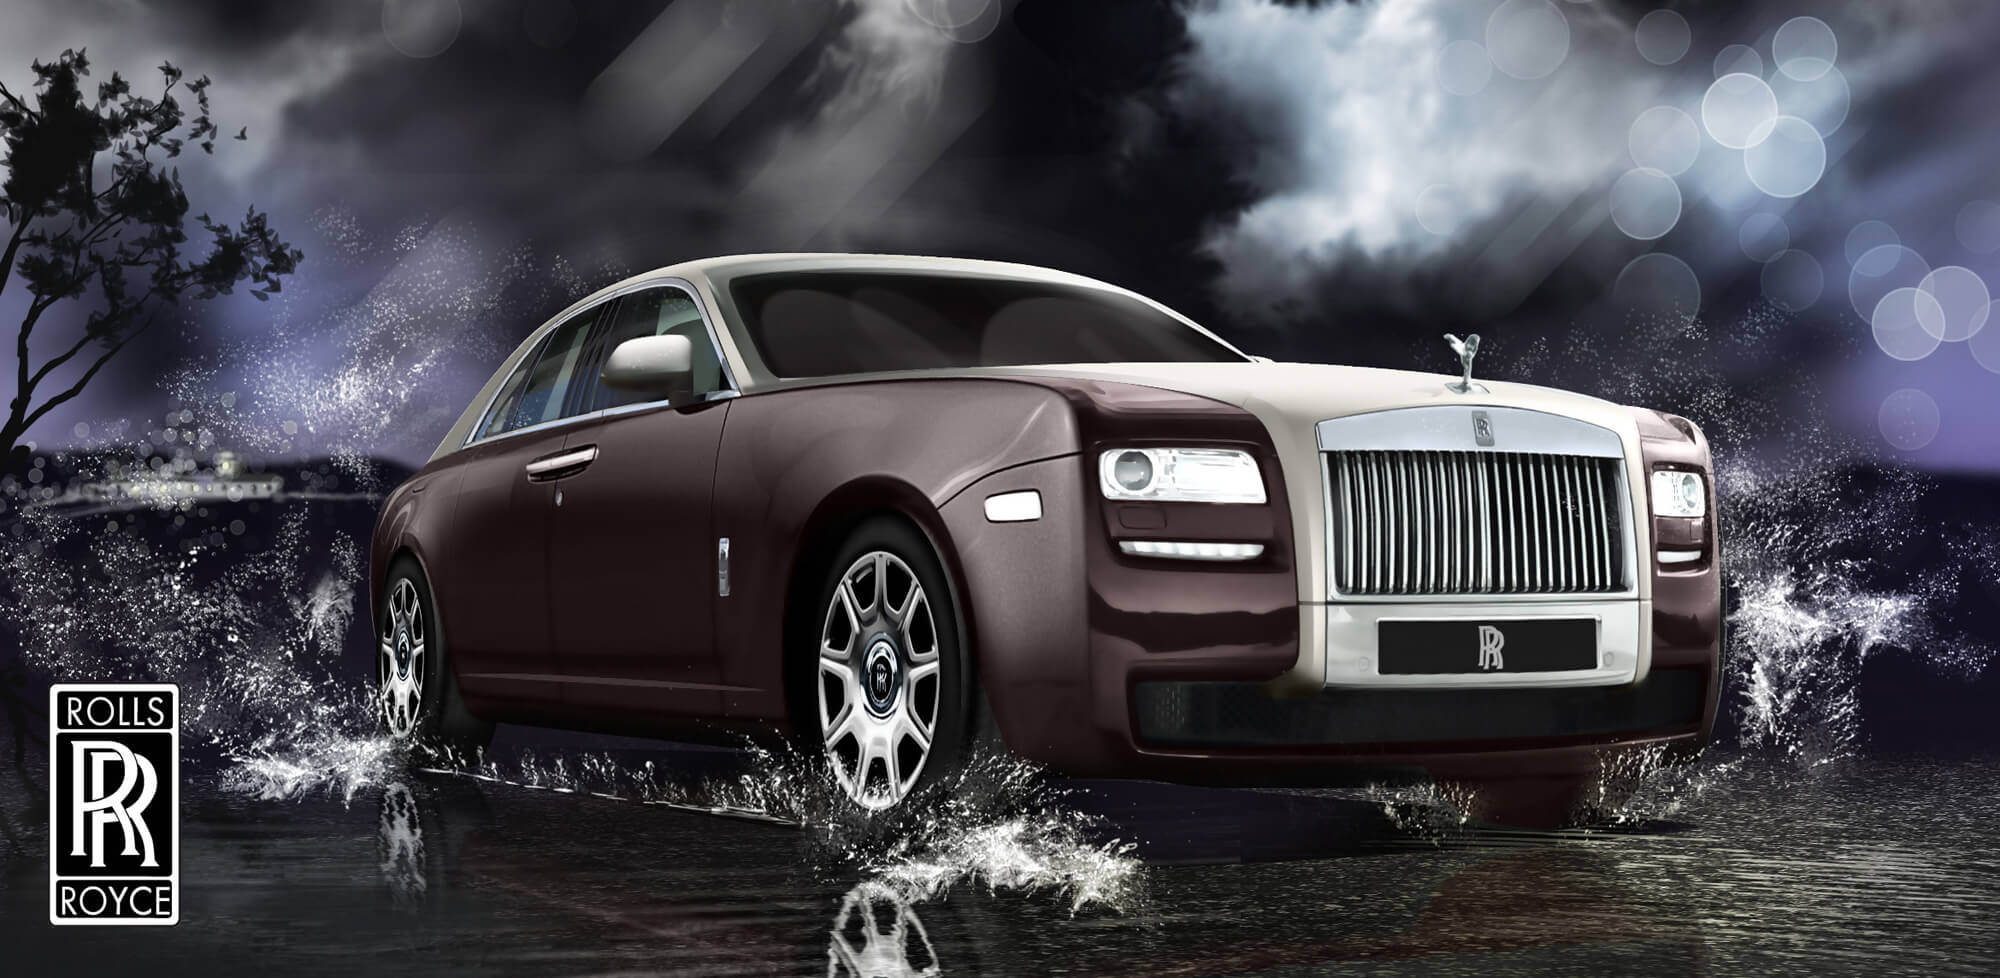 Rolls_Royce_Print_Ads_3.jpg